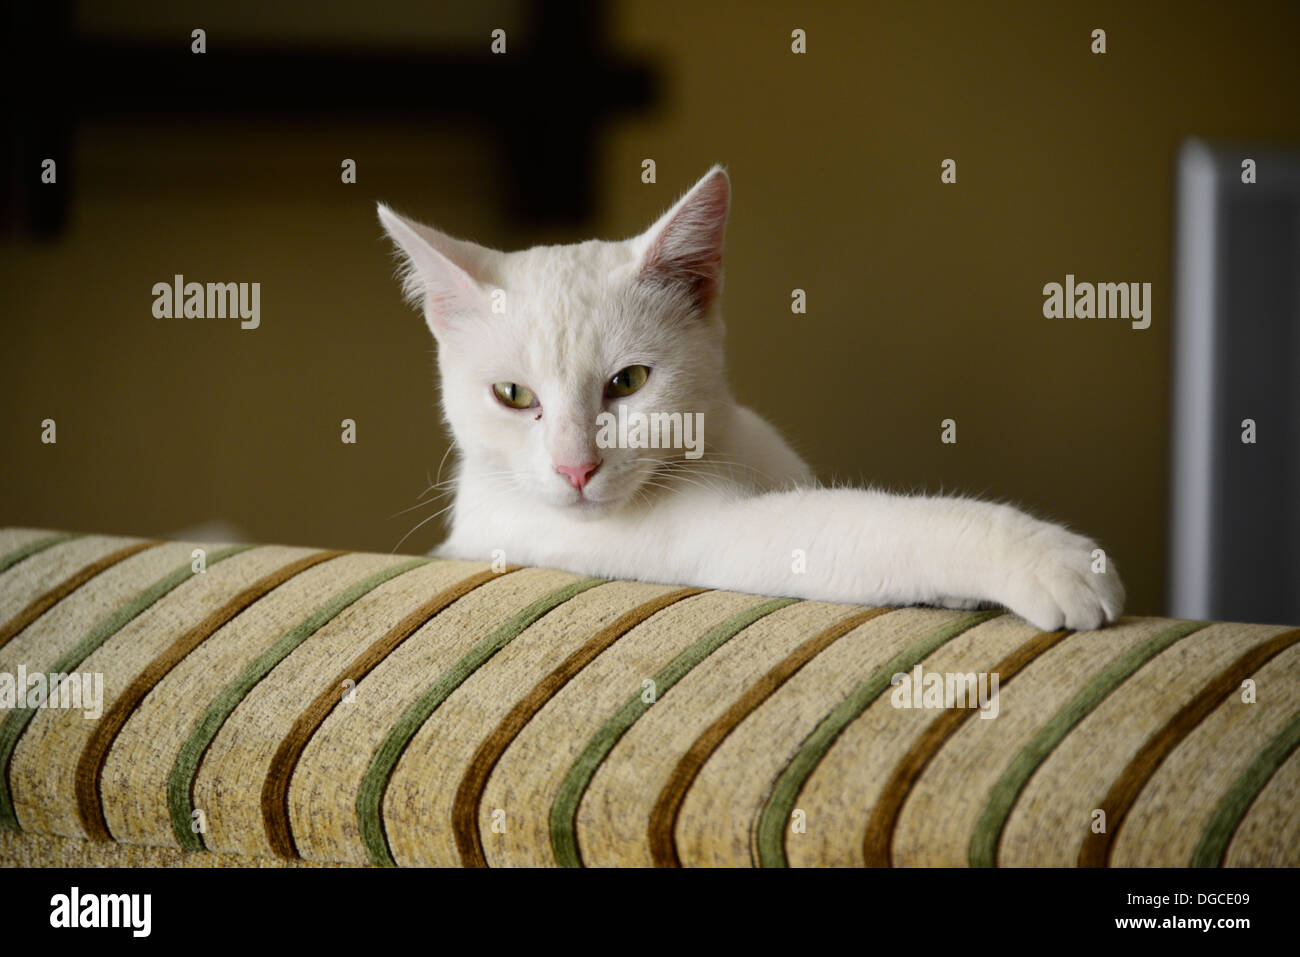 White cat portrait. - Stock Image